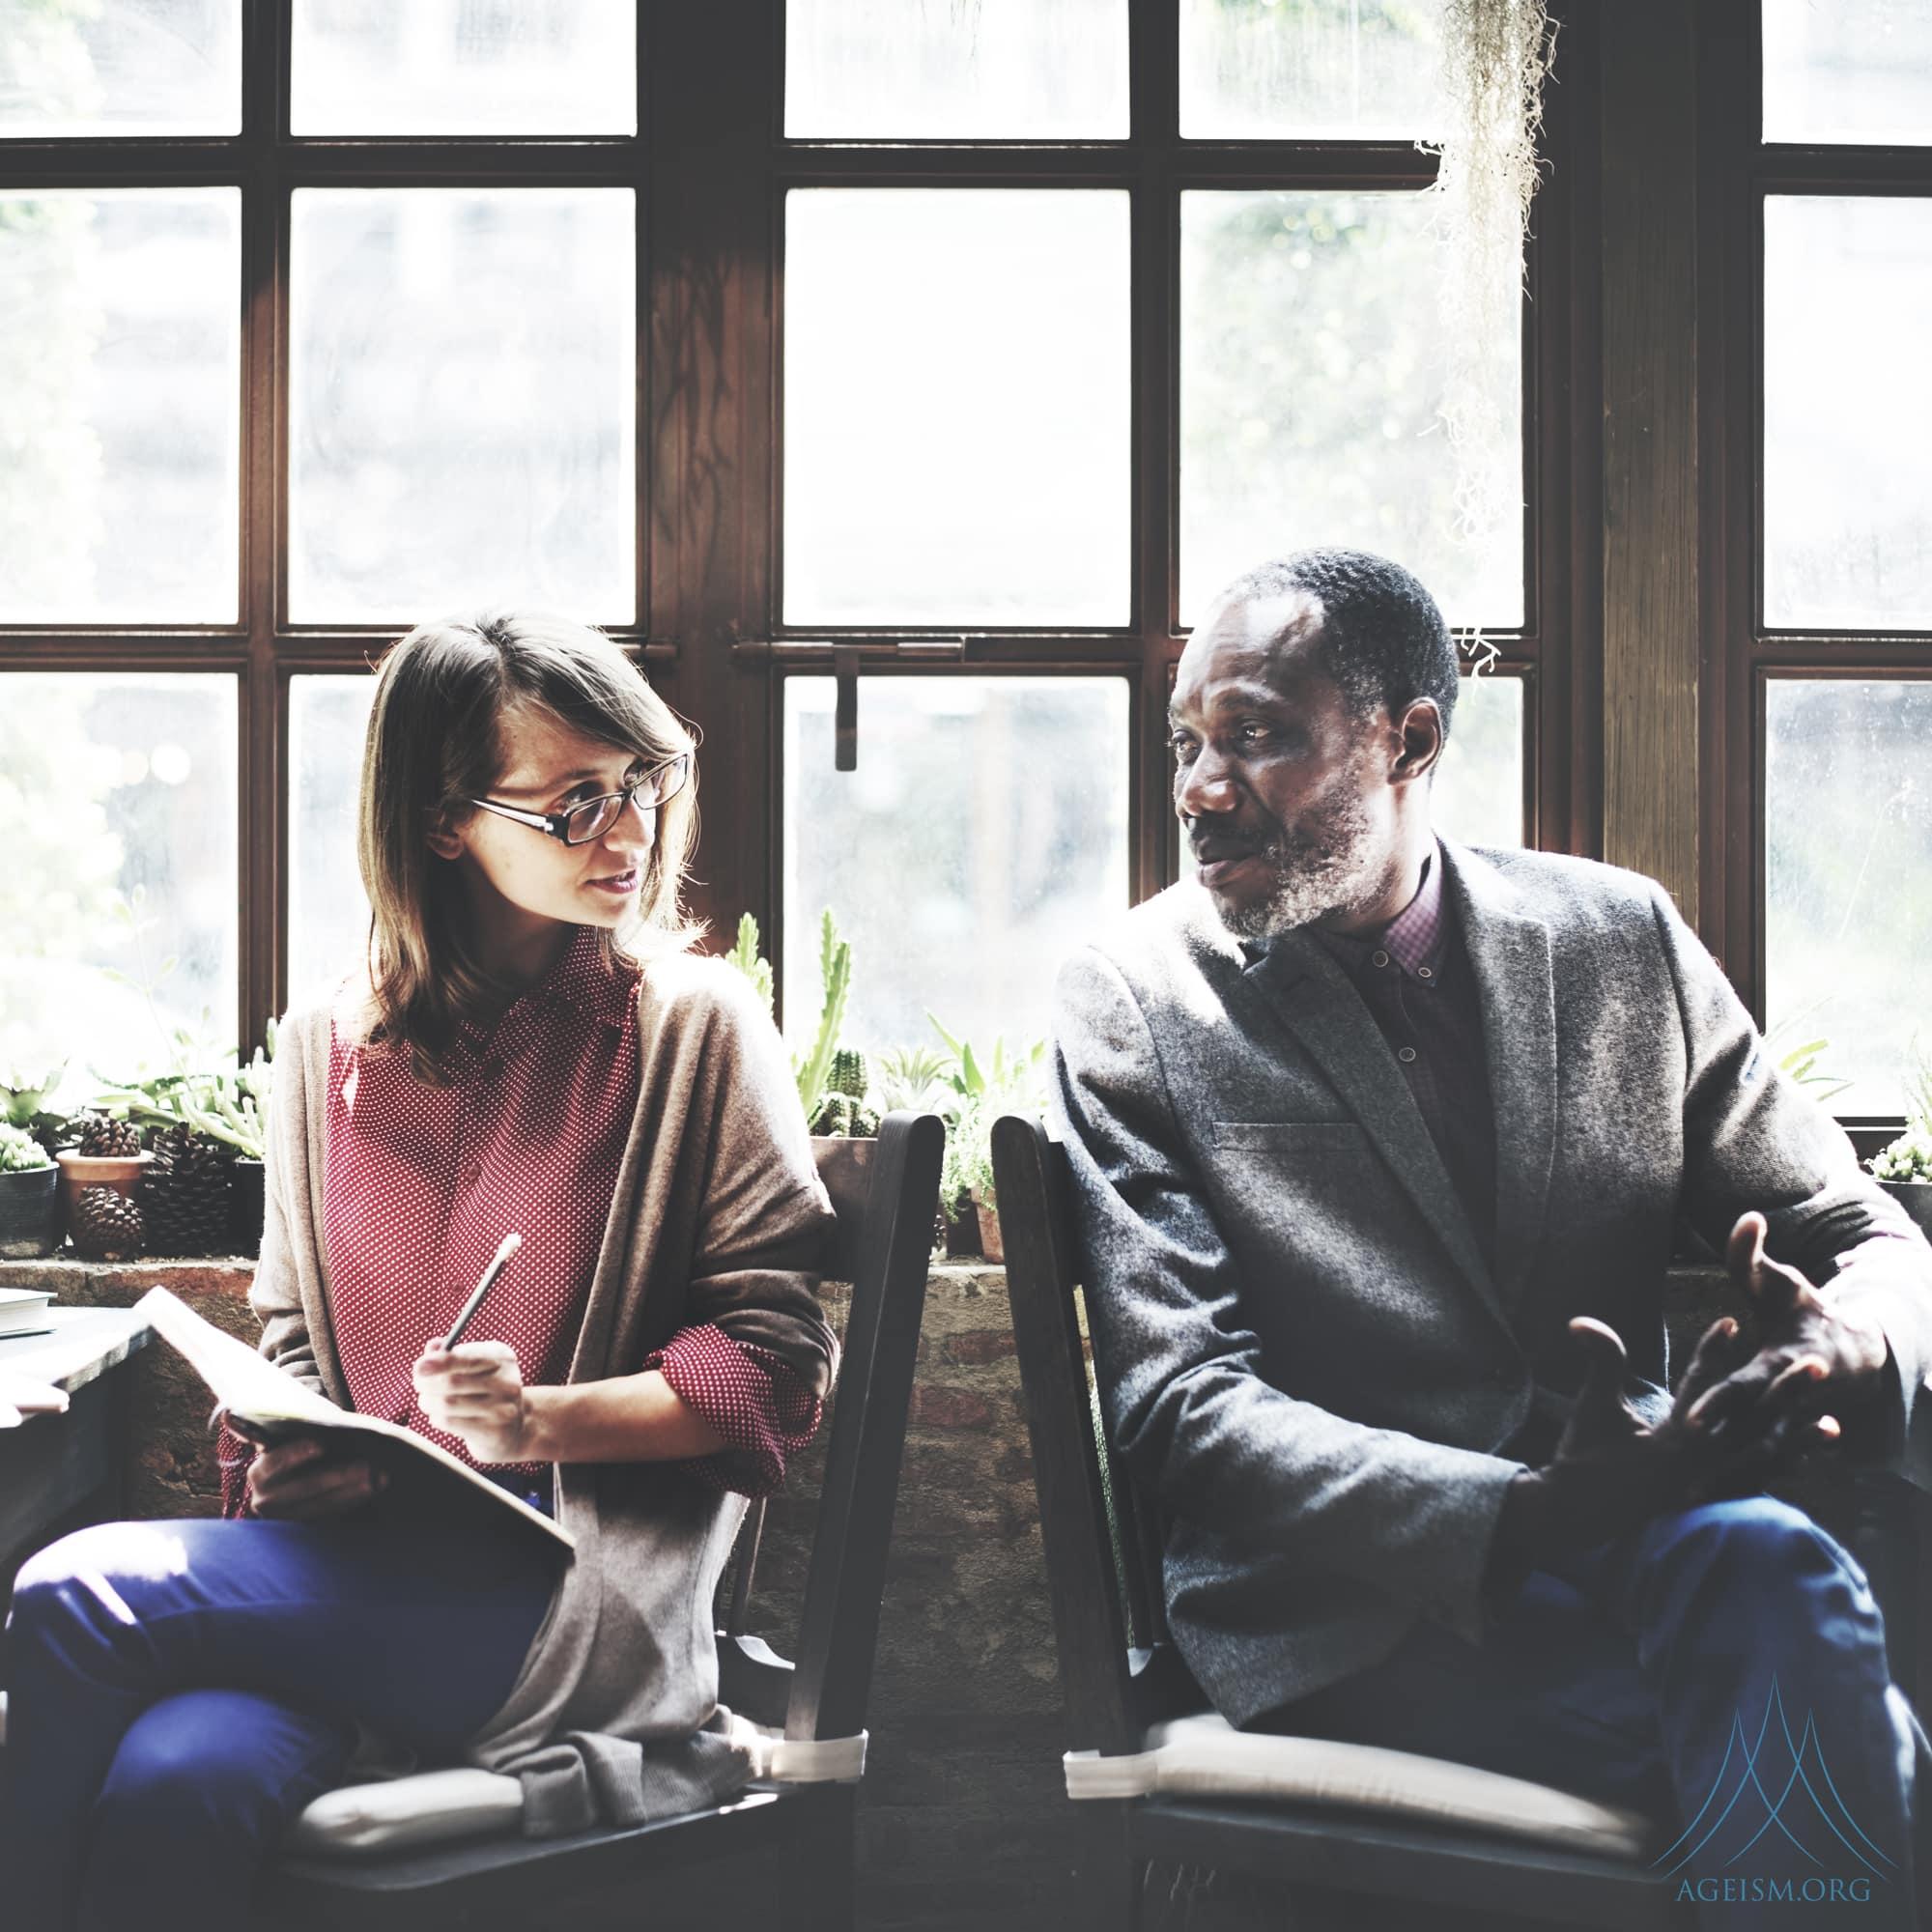 Start Ageism Conversation